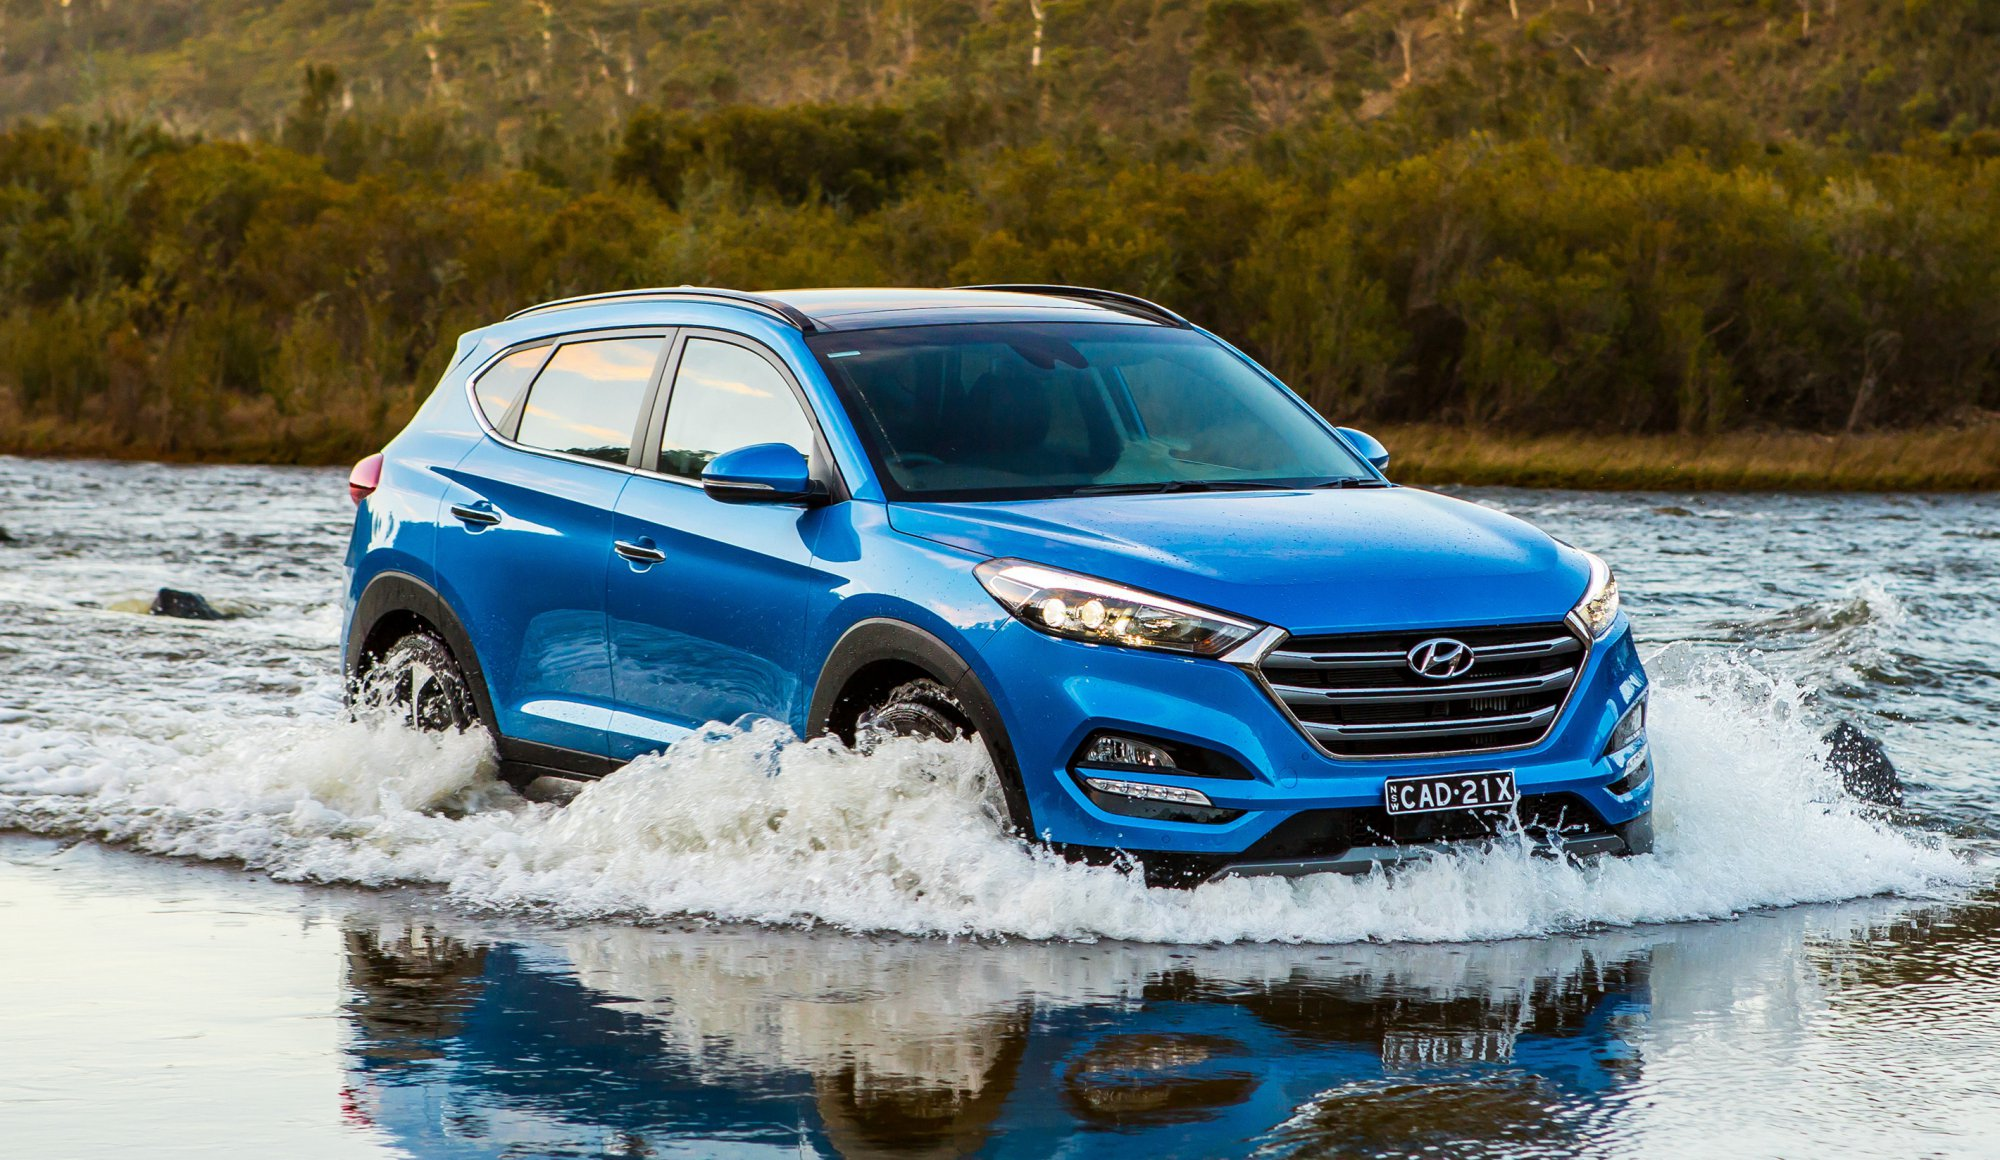 Hyundai Santa Fe 2018 Model >> News - 2018 Hyundai Tucson Gets Brawnier, Smarter